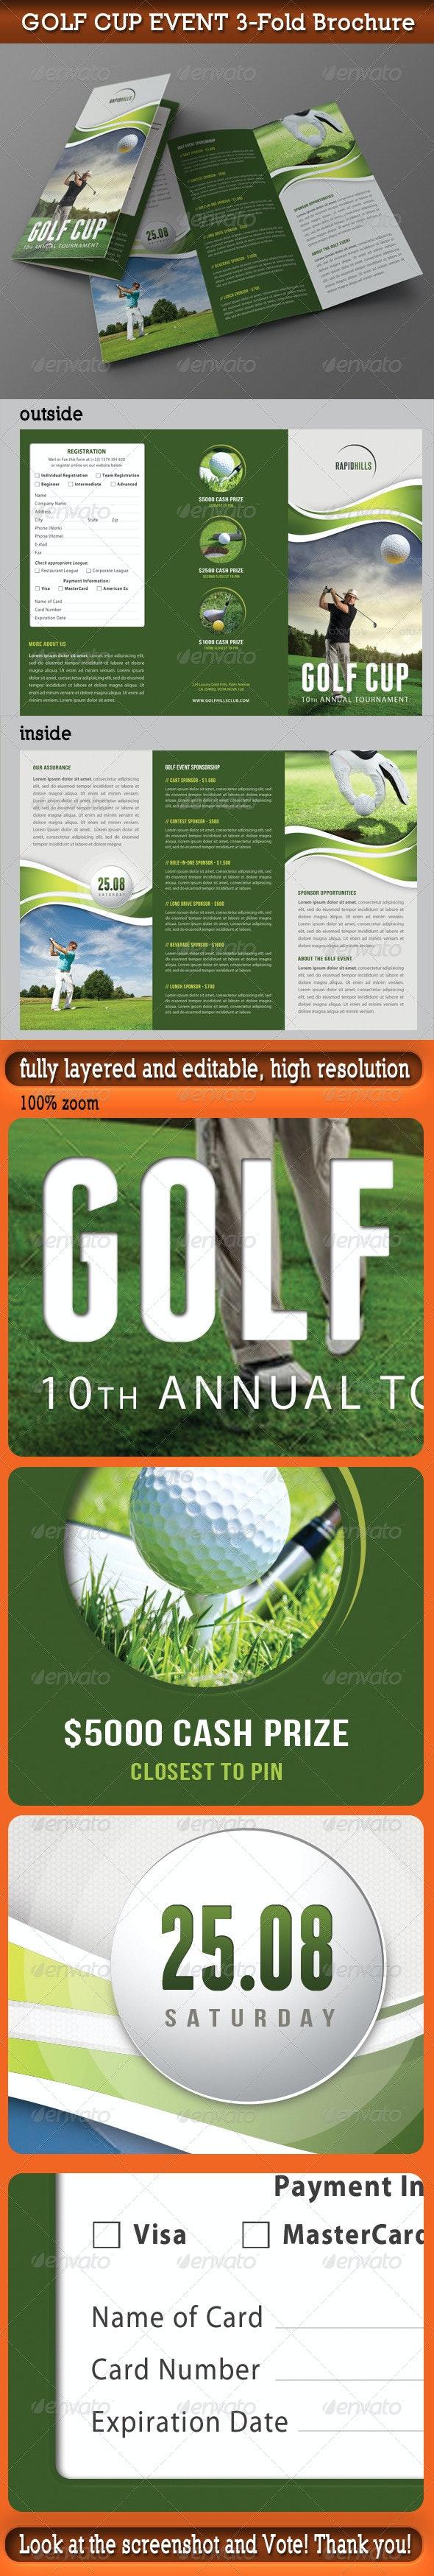 Golf Cup Event 3-Fold Brochure 01 - Corporate Brochures